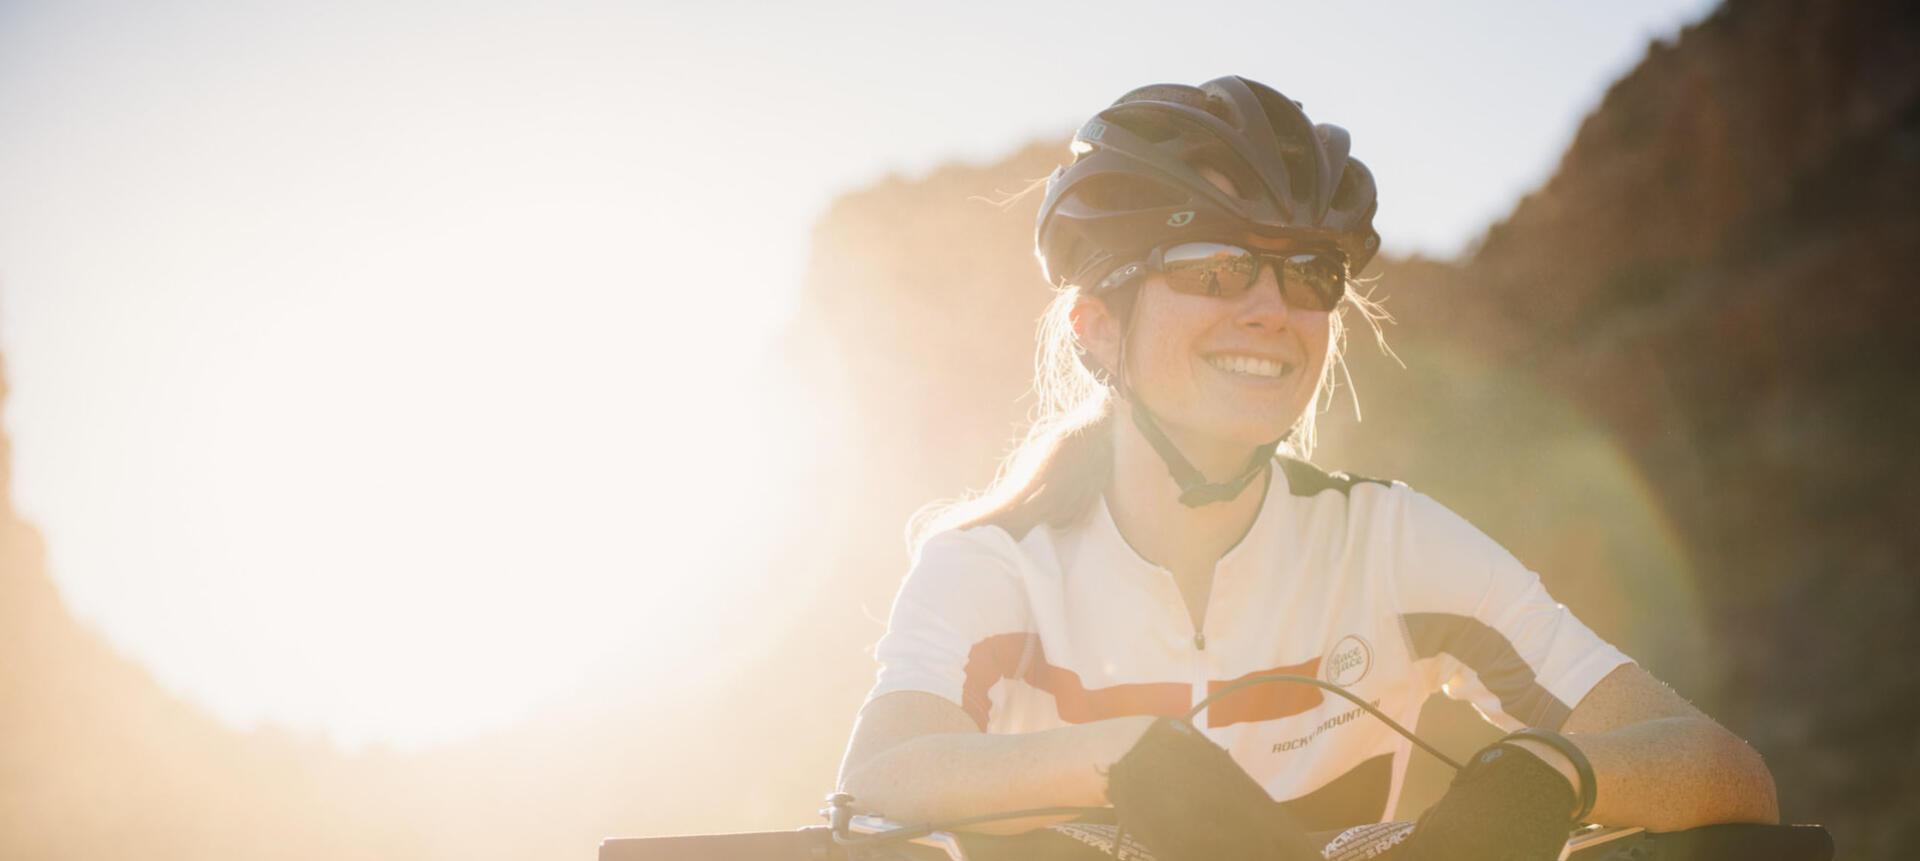 Gold-Level Ride Center Mountain Biking at Deer Valley Resort